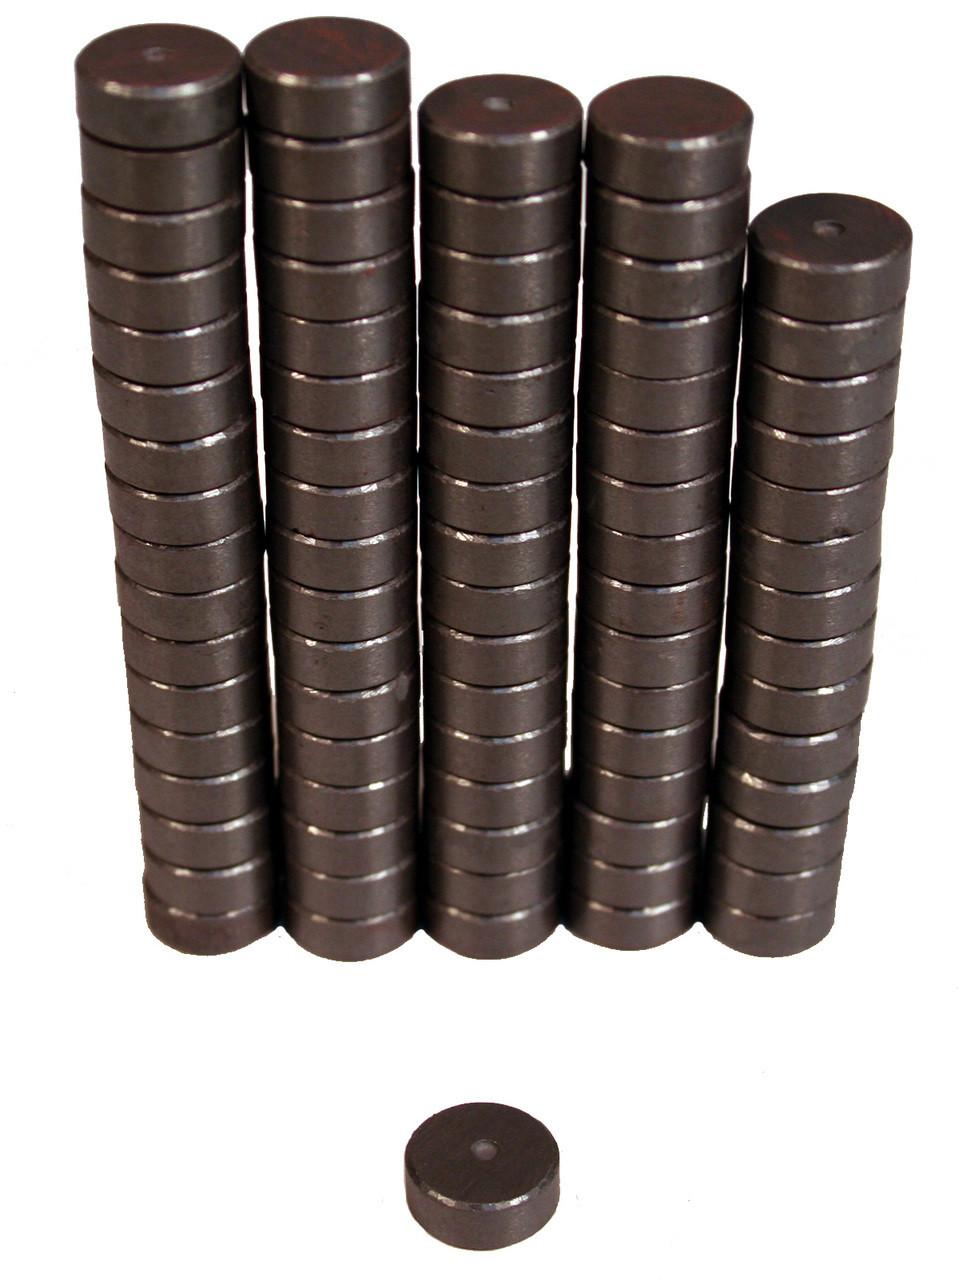 Magnets 1 2 Inch Diameter Round Ceramic Disc Magnets